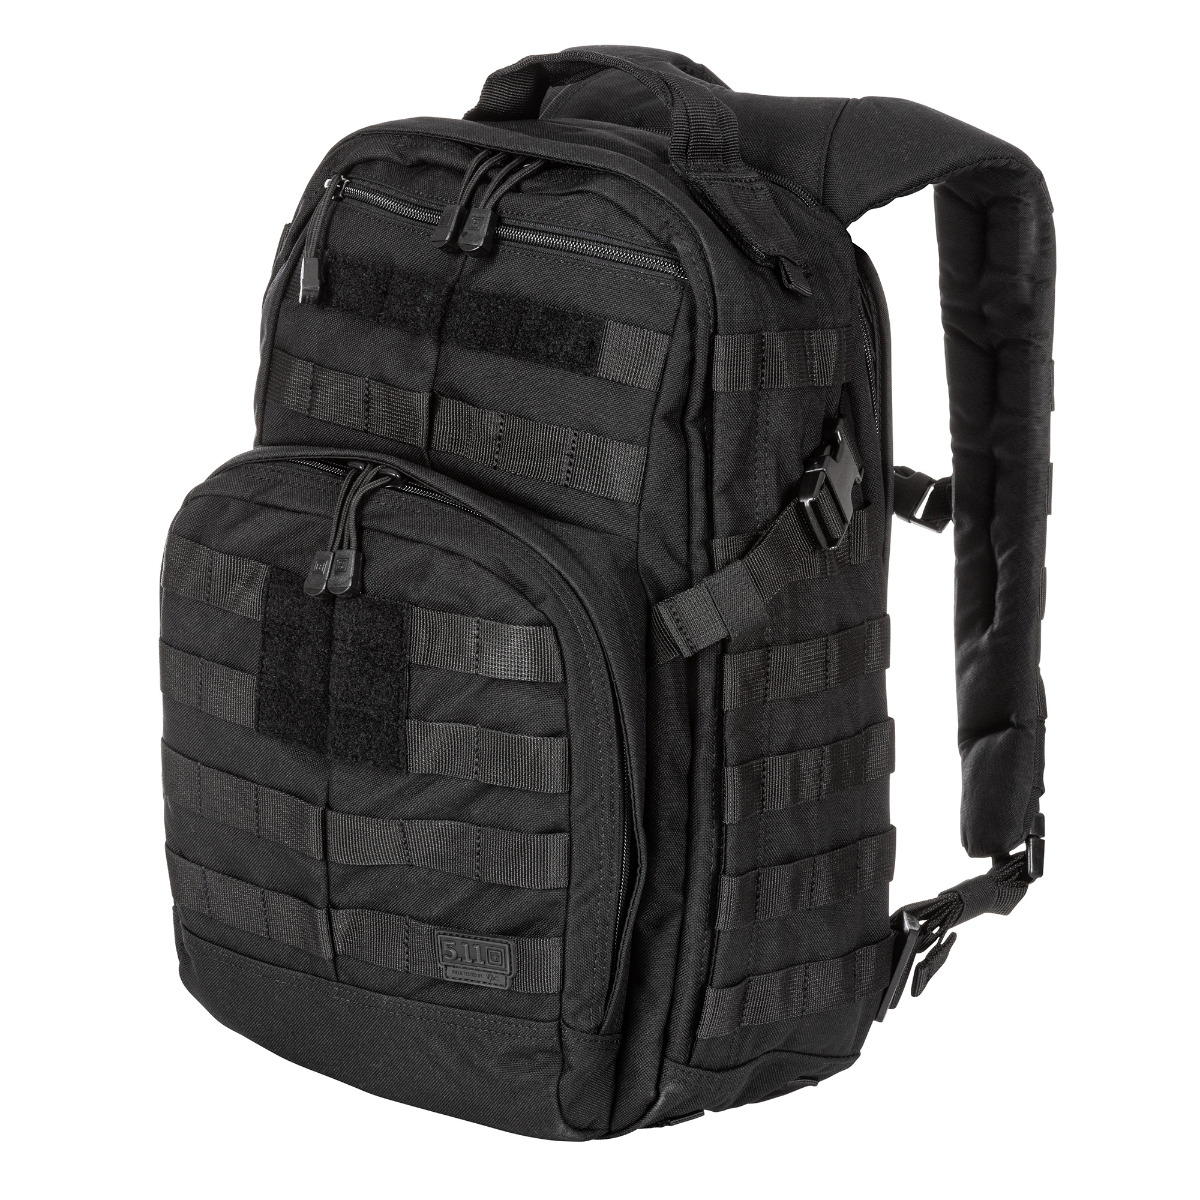 06820595574e 5.11 Tactical RUSH 24 Tactical Backpack - 5.11 Tactical